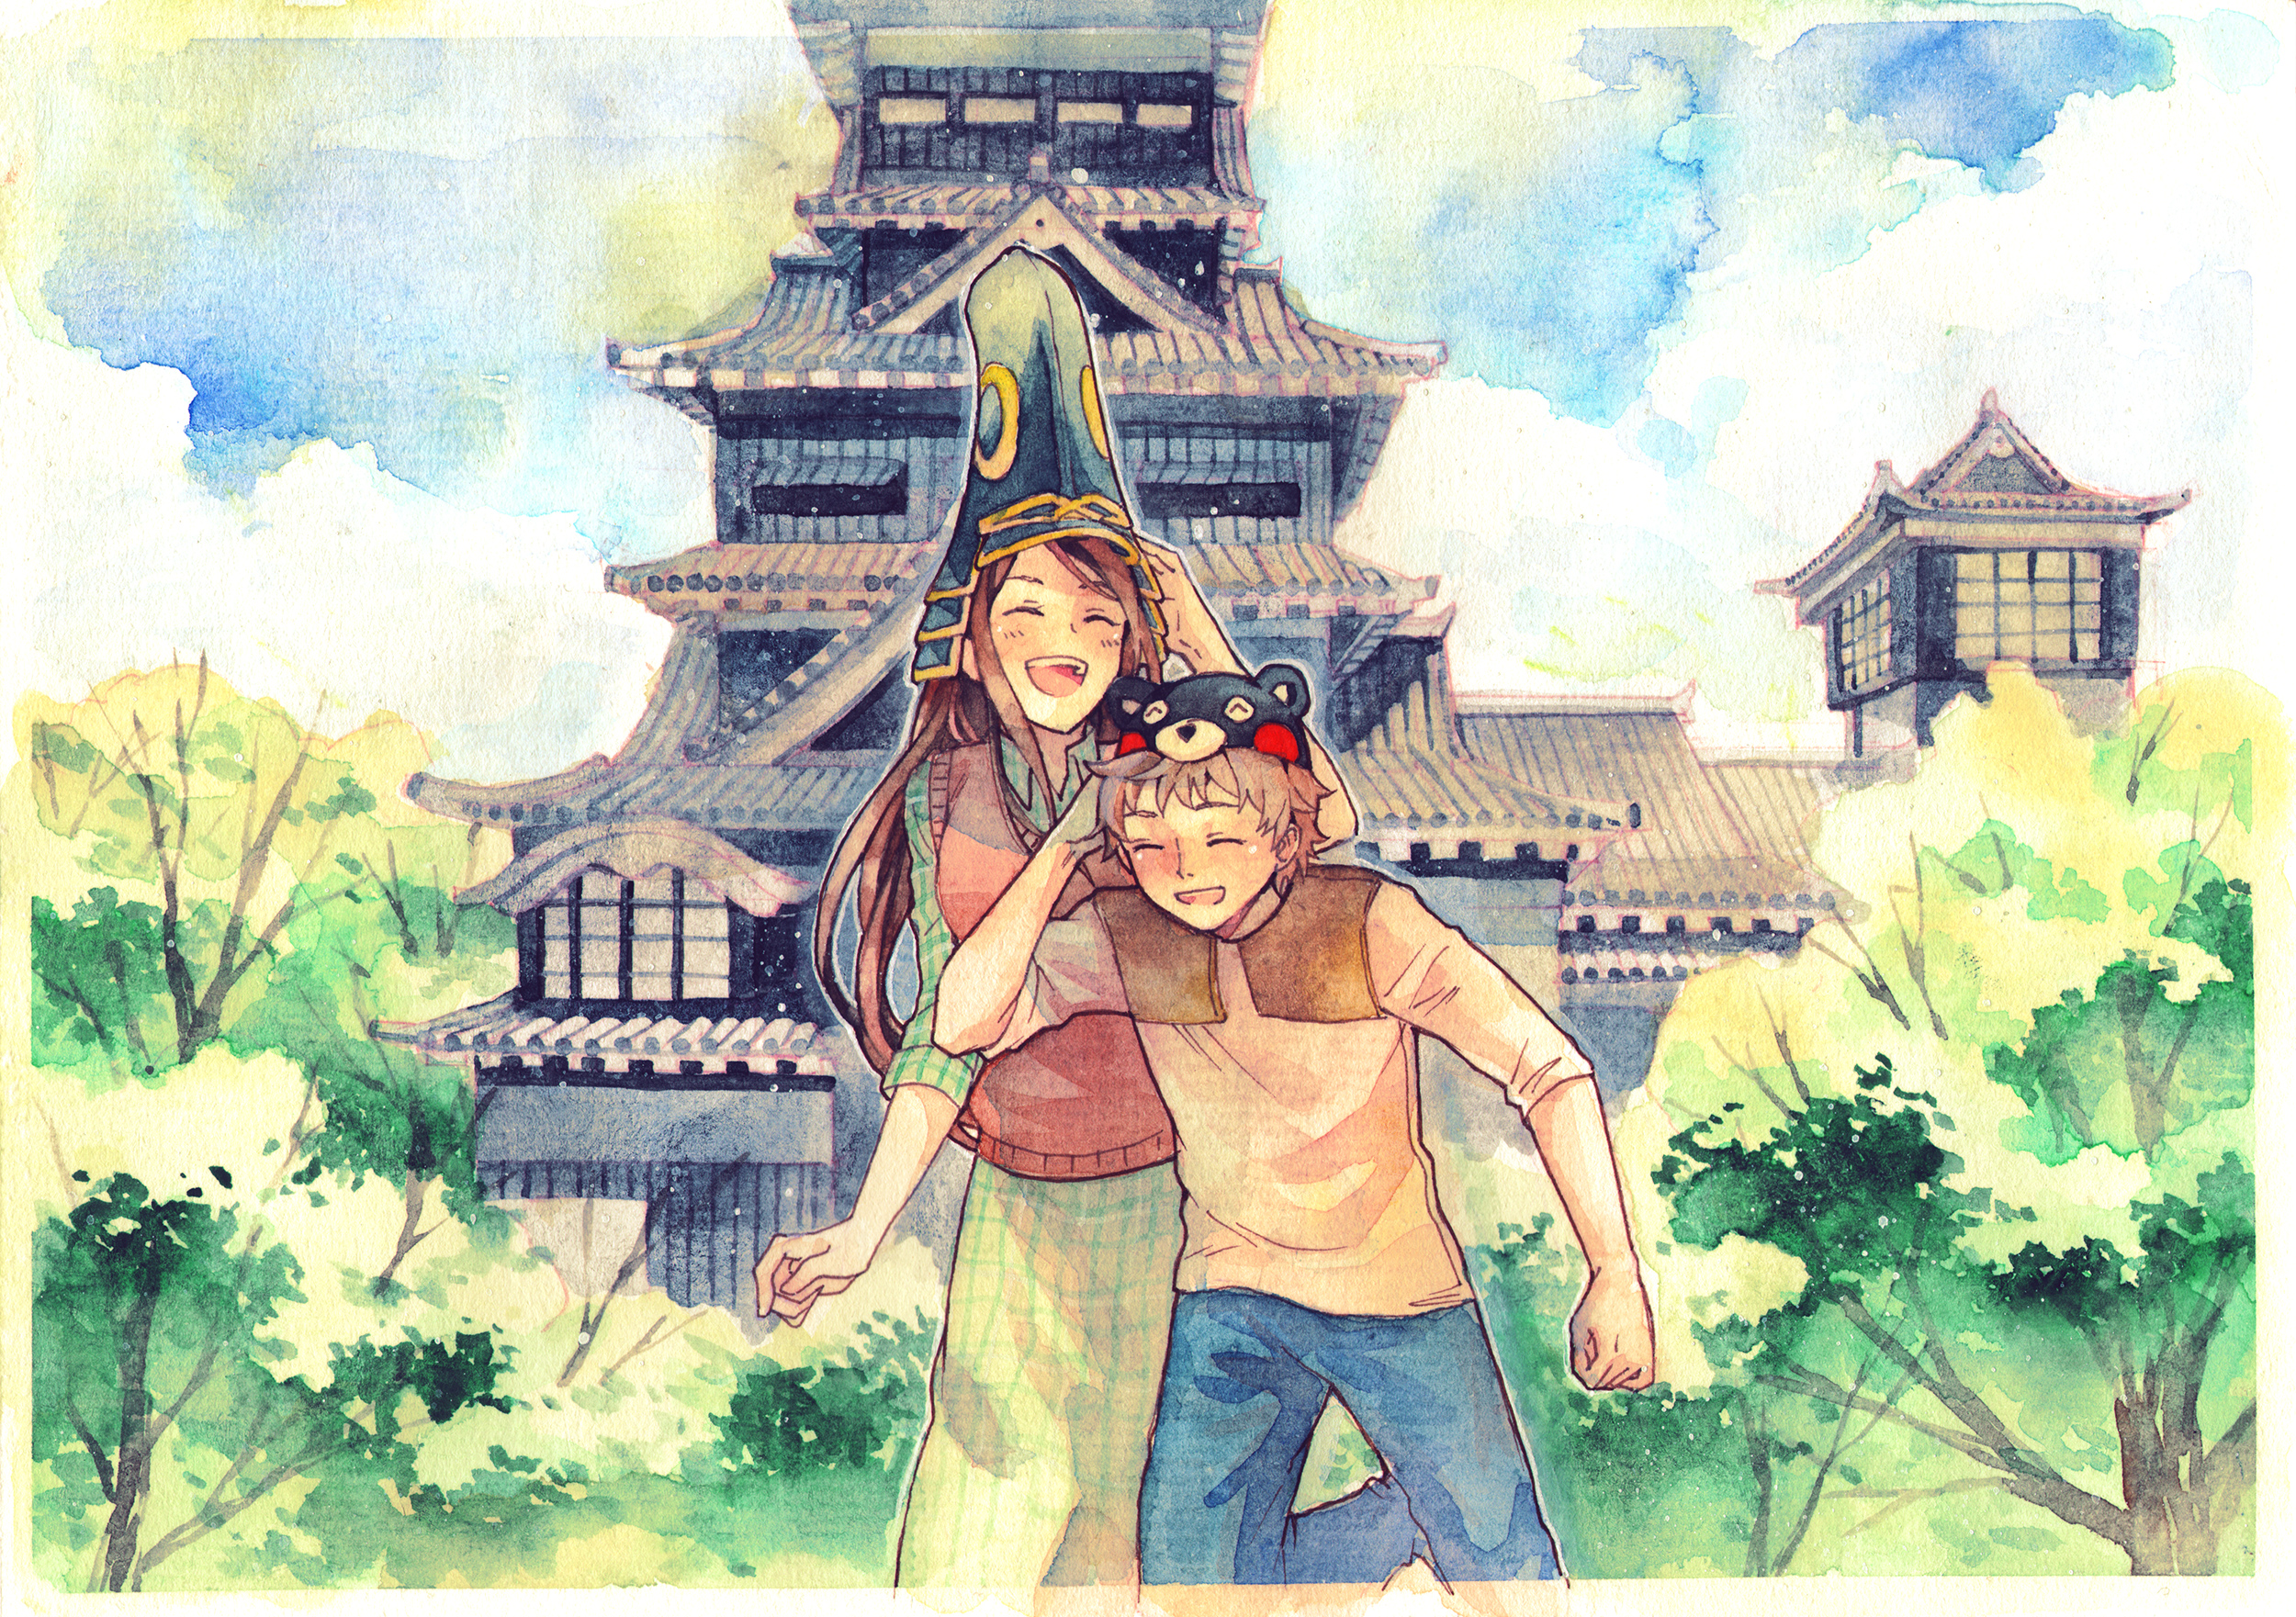 roomuninstall/Smiling Kumamoto by roomuninstall